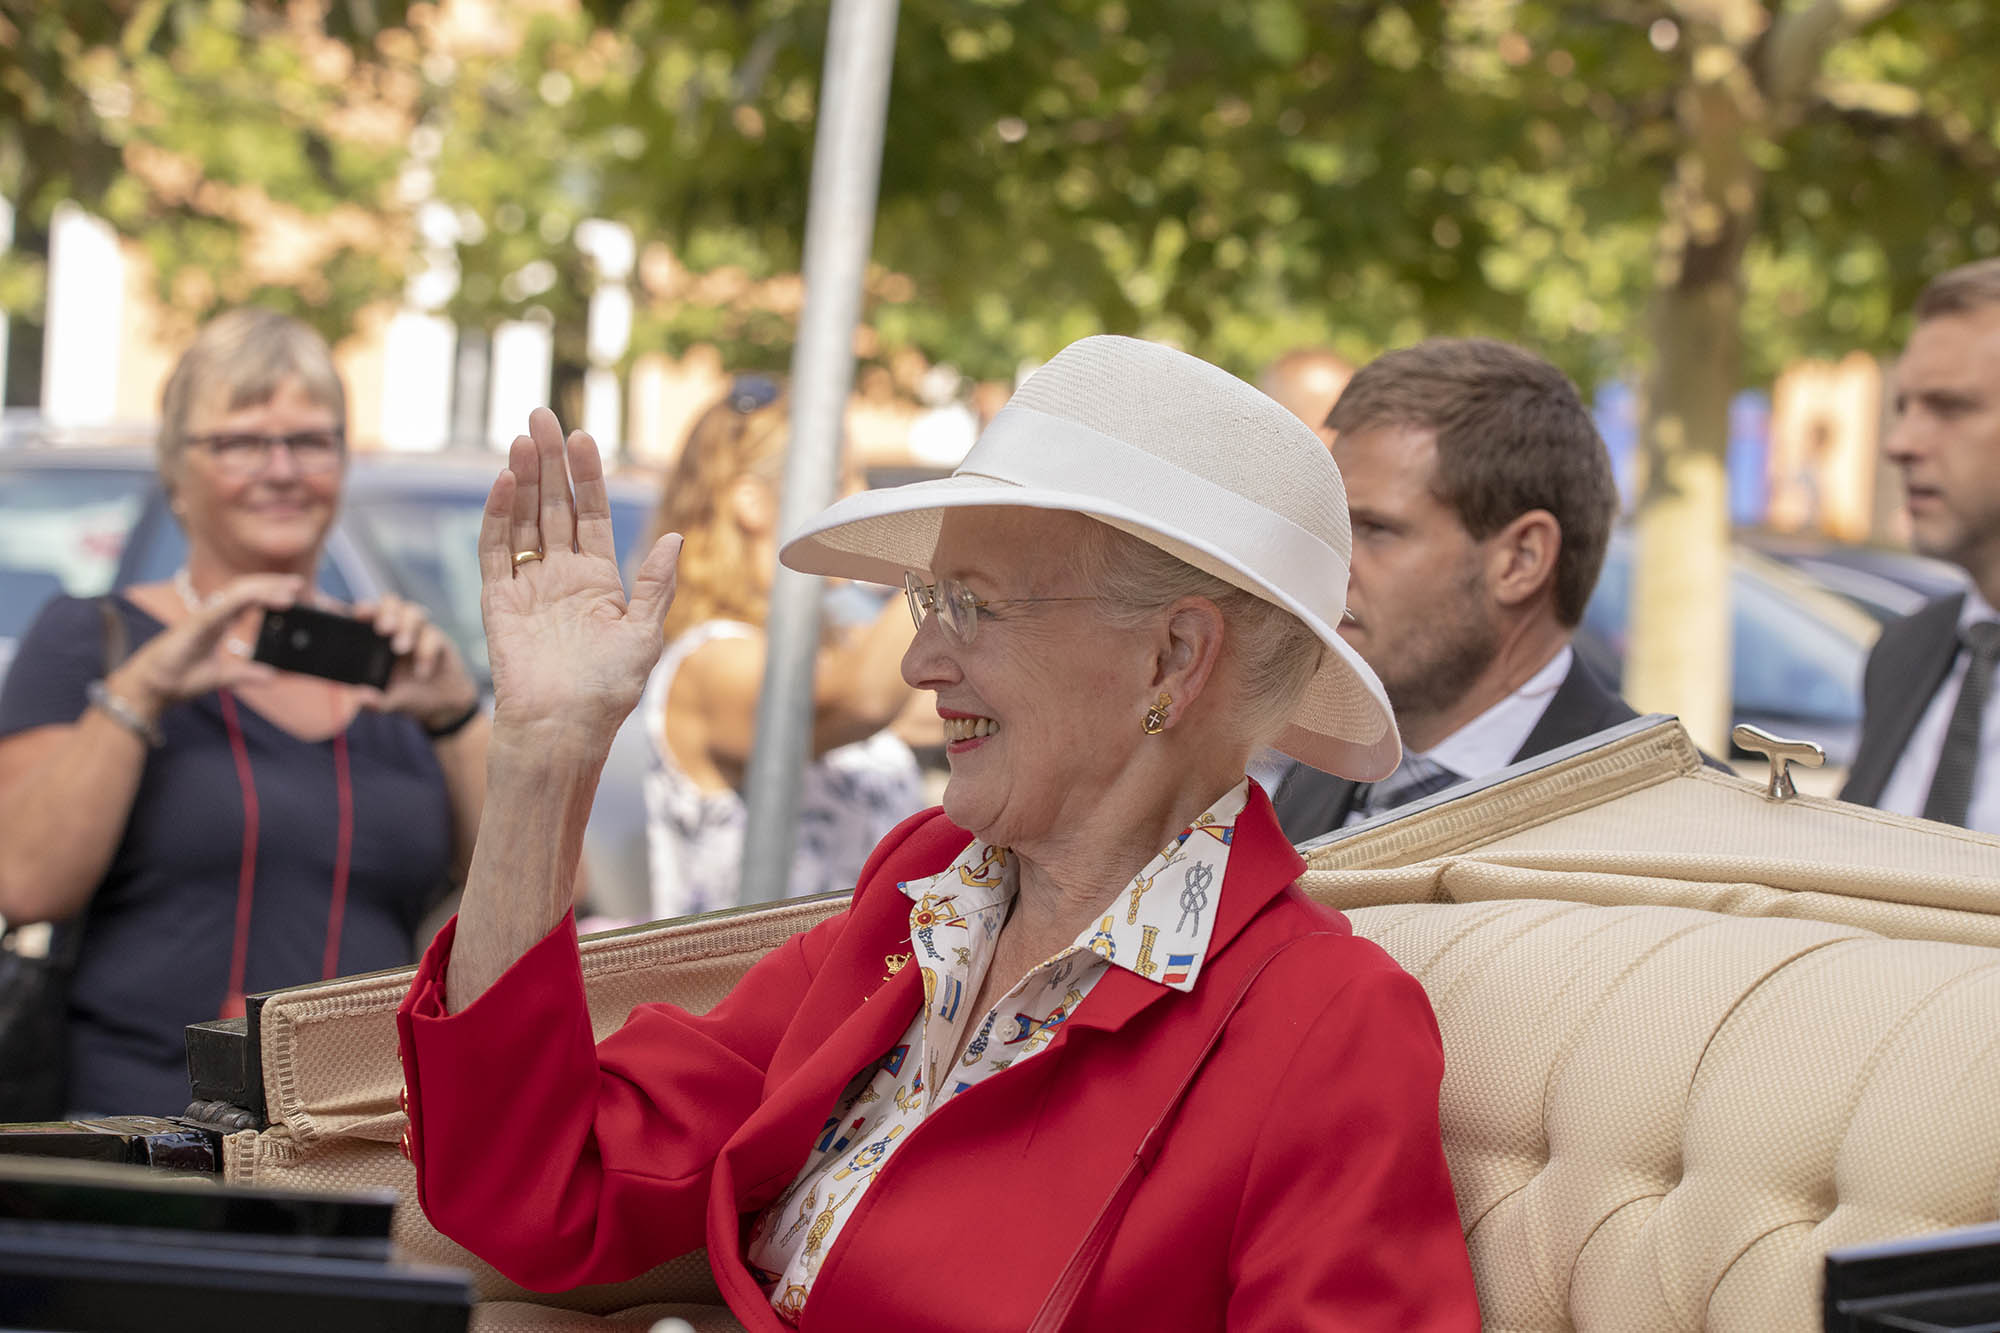 Dronning Margrethe   Maritimt klædt dronning i Svendborg